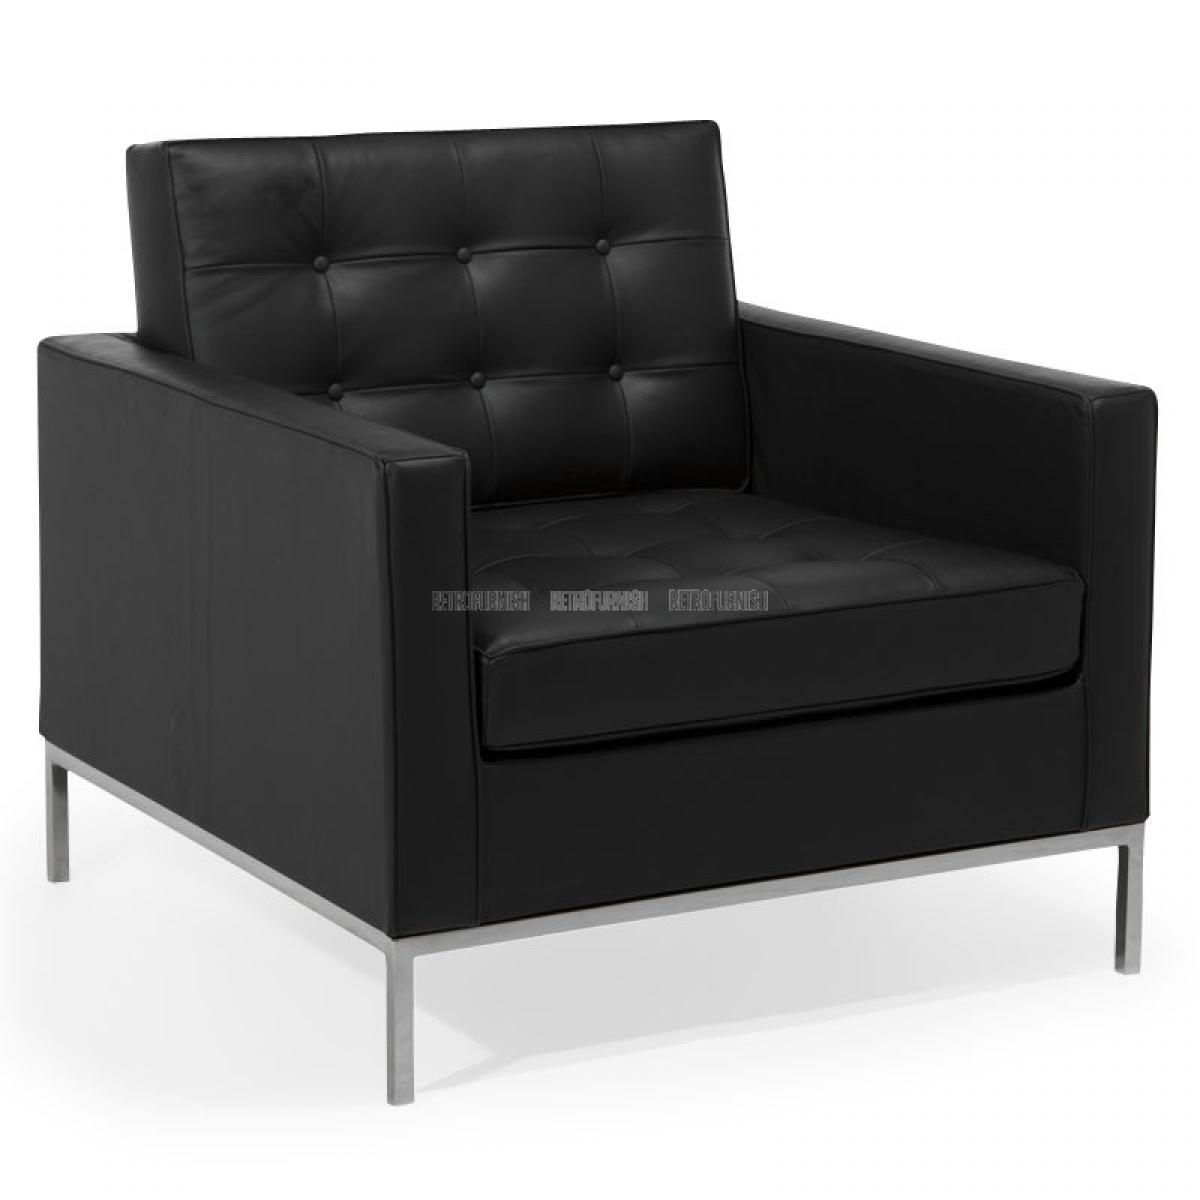 photos canap knoll prix. Black Bedroom Furniture Sets. Home Design Ideas